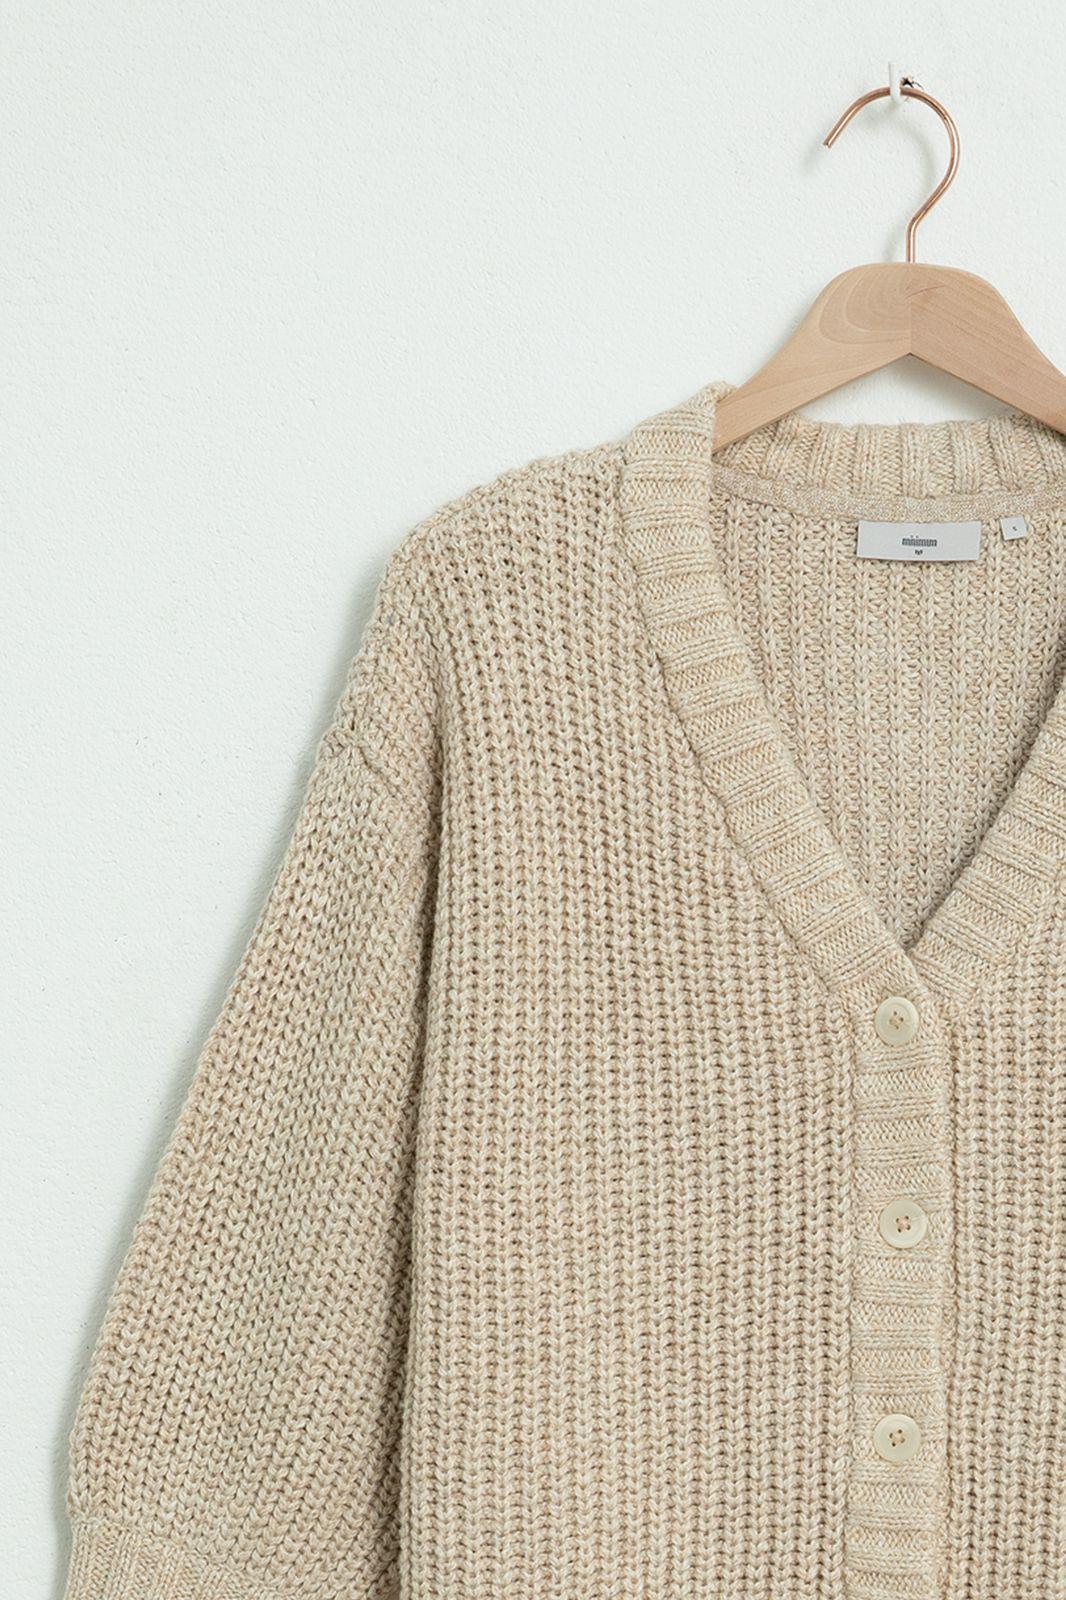 MINIMUM beige vest Ciliana 7452 - Dames | Sissy-Boy